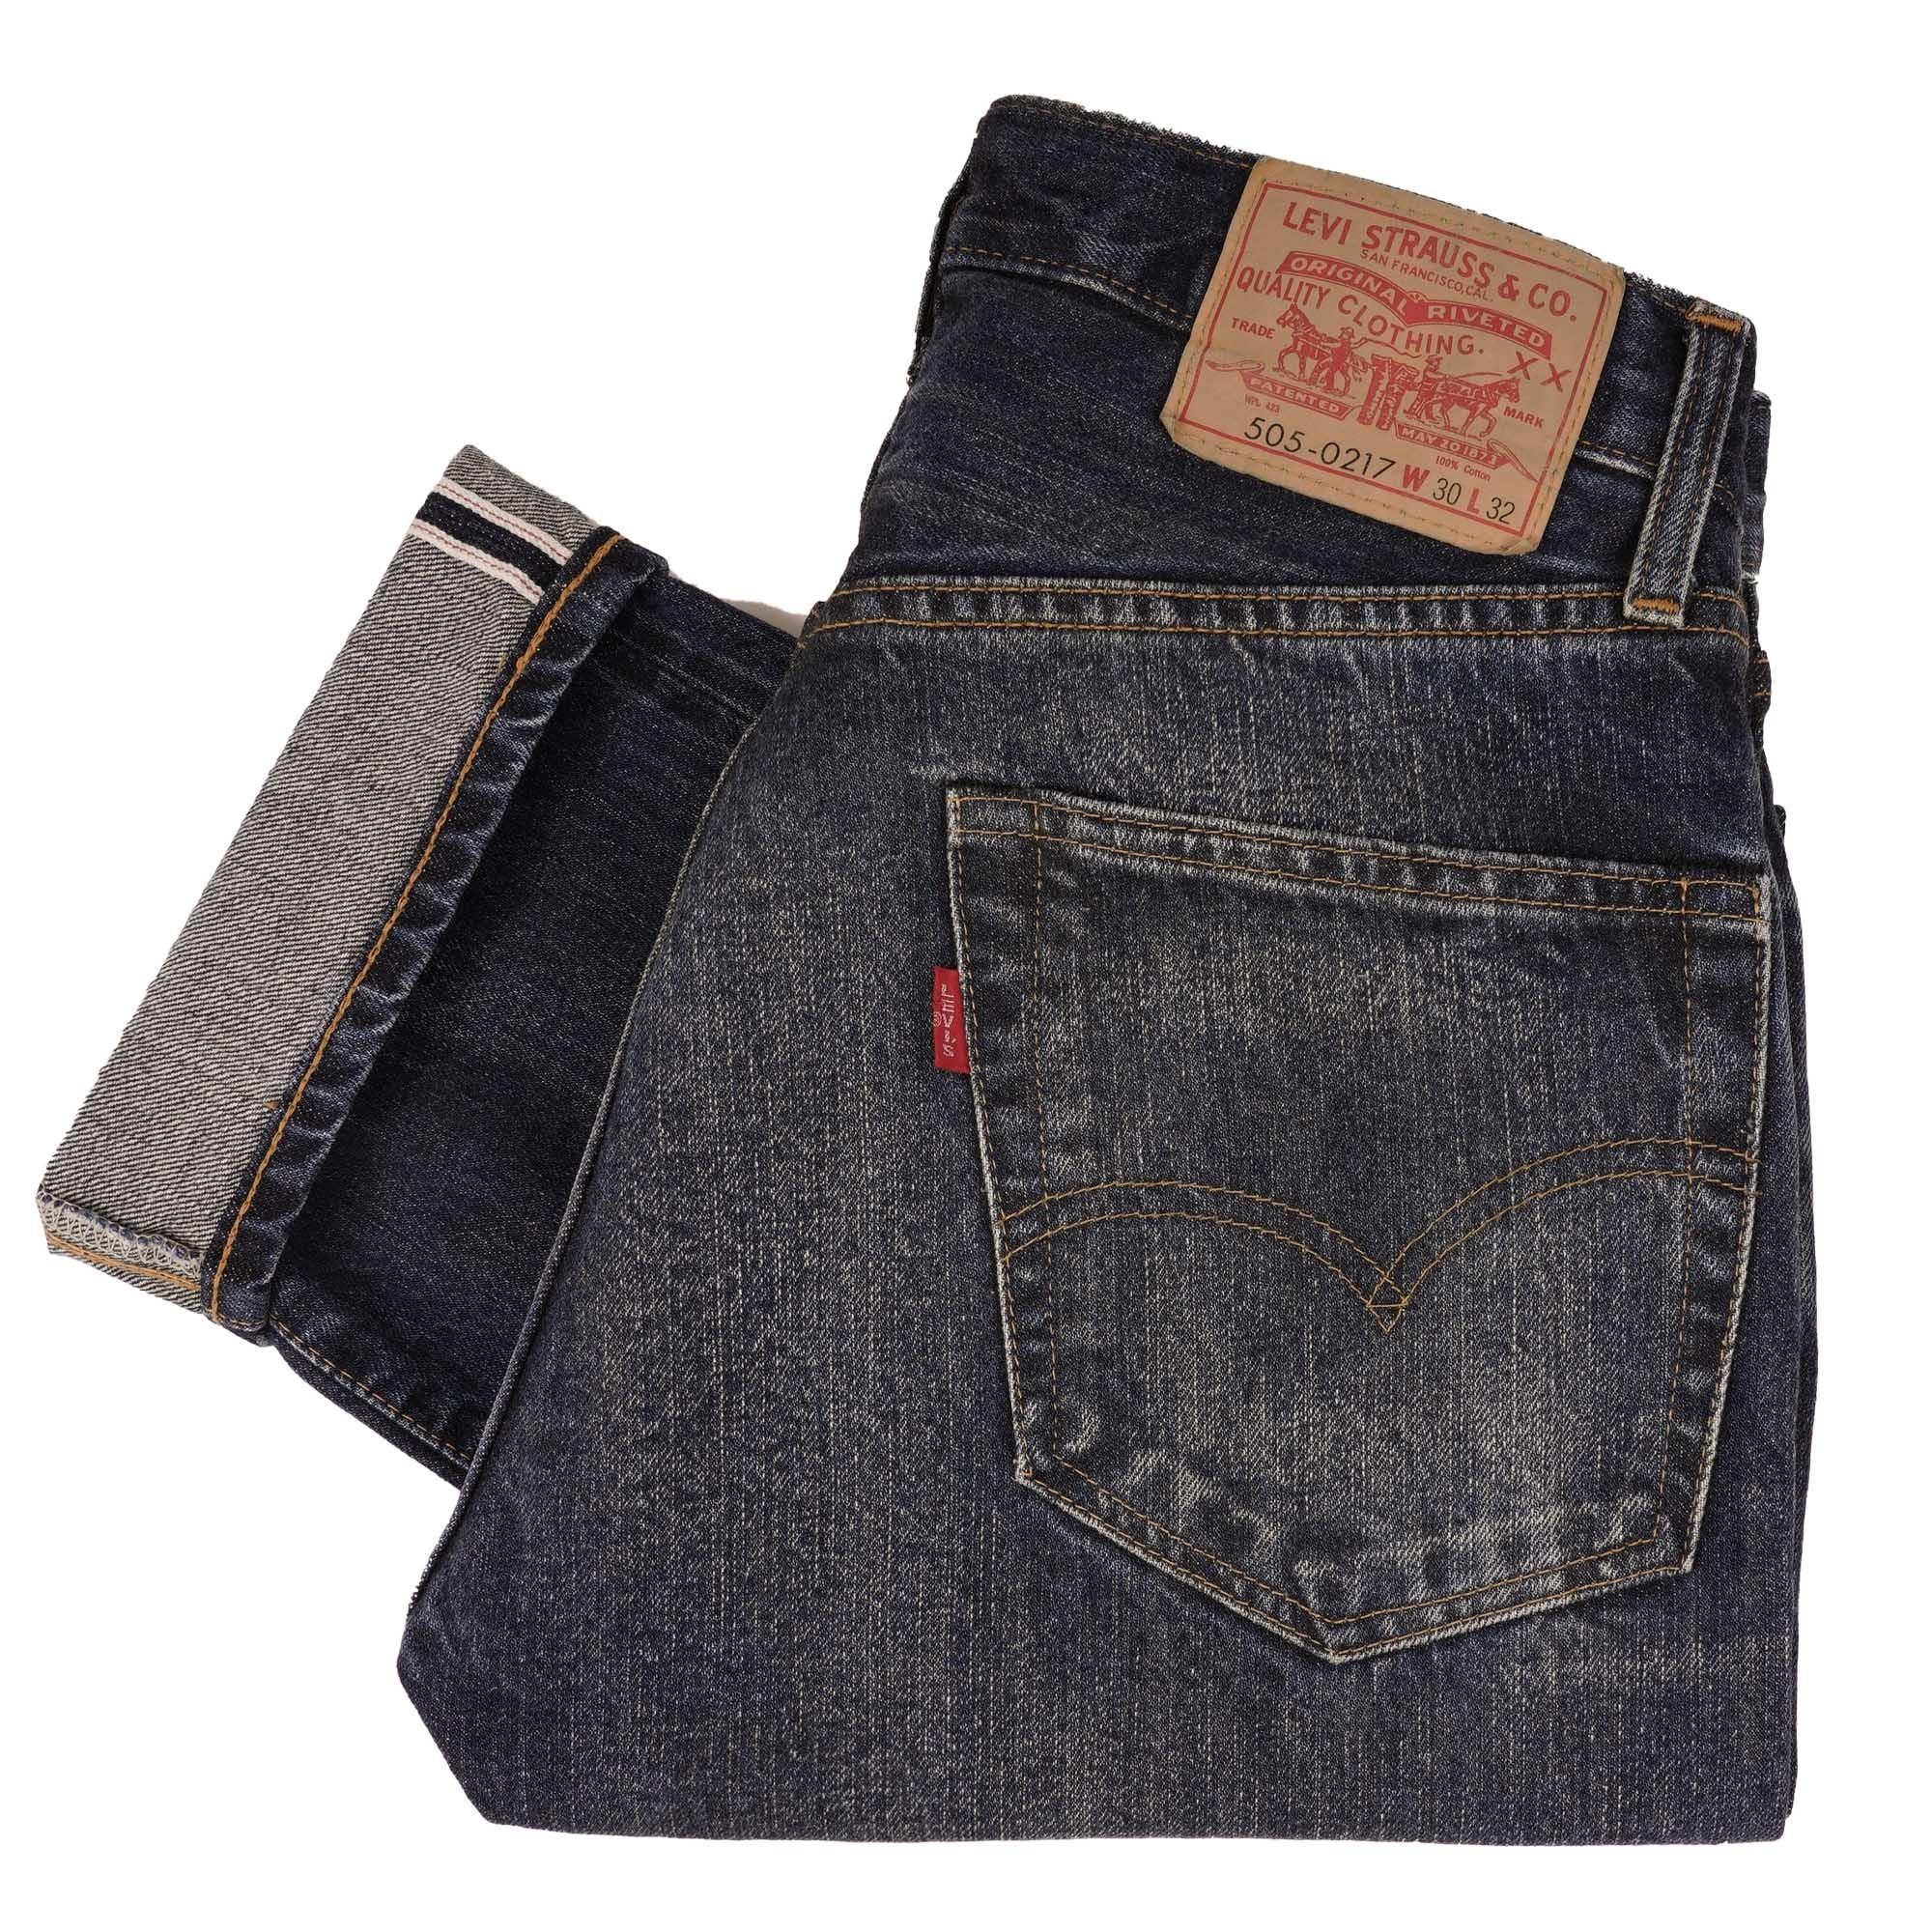 8d1f4fafea1 Levi's Vintage 1967 505 Selvedge Jeans | Cosmos | US Stockists